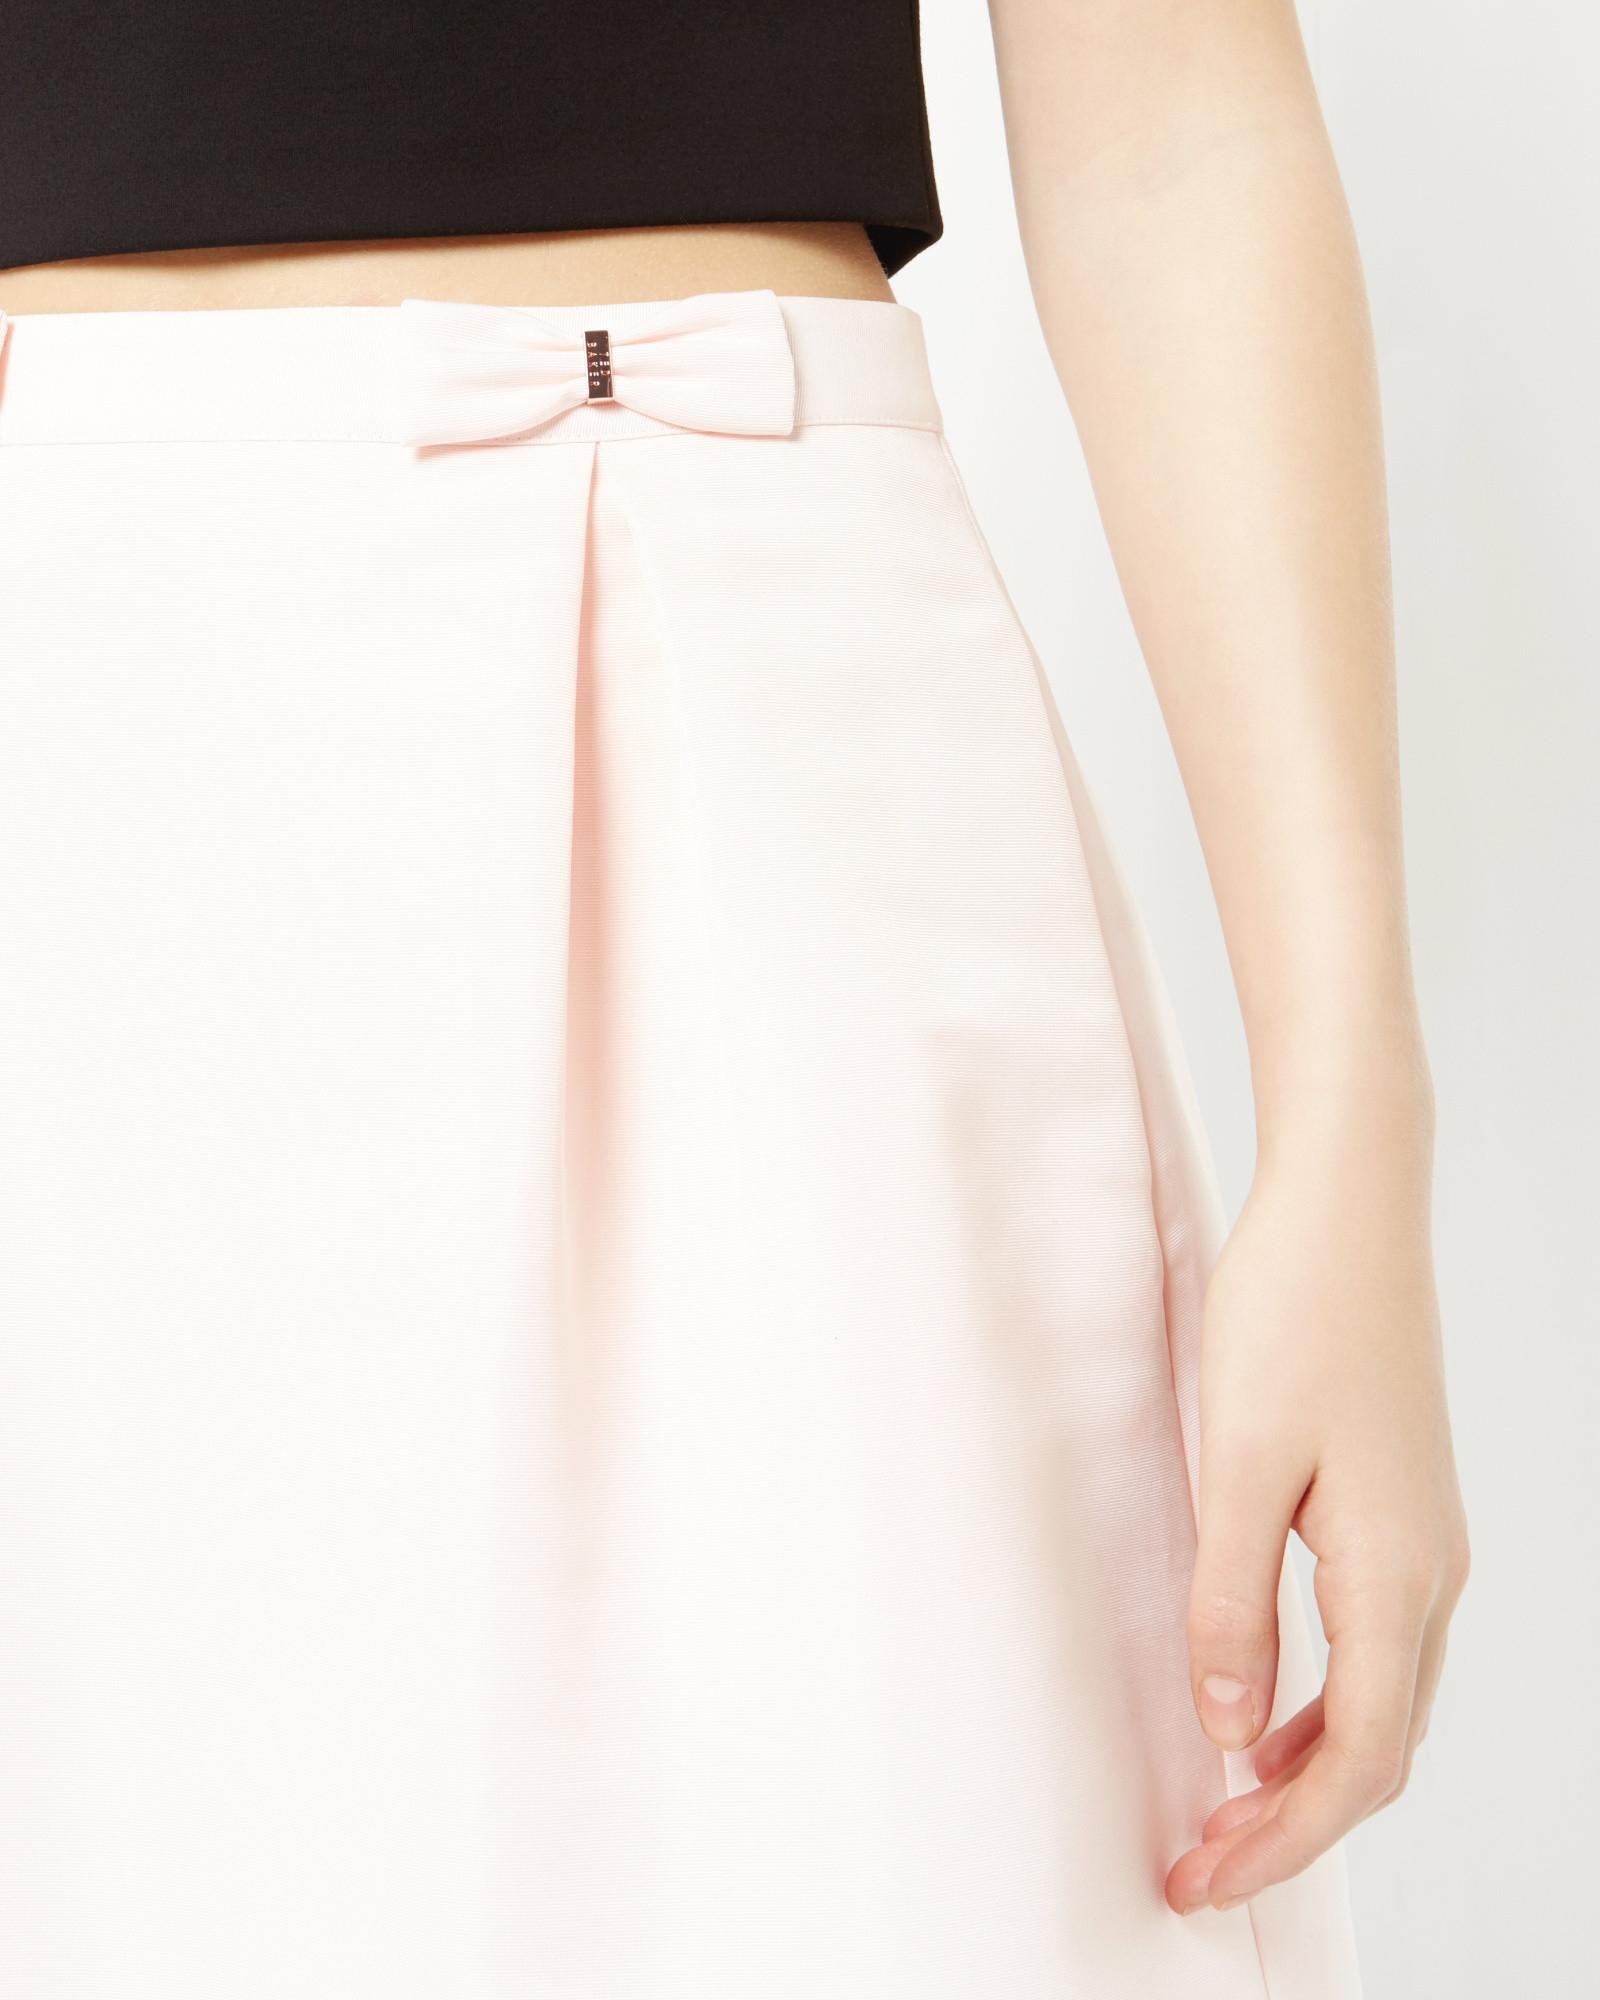 Bow Mini Skirt Ted Baker Buy Cheap Best Wholesale Discount Big Discount Rj1niu